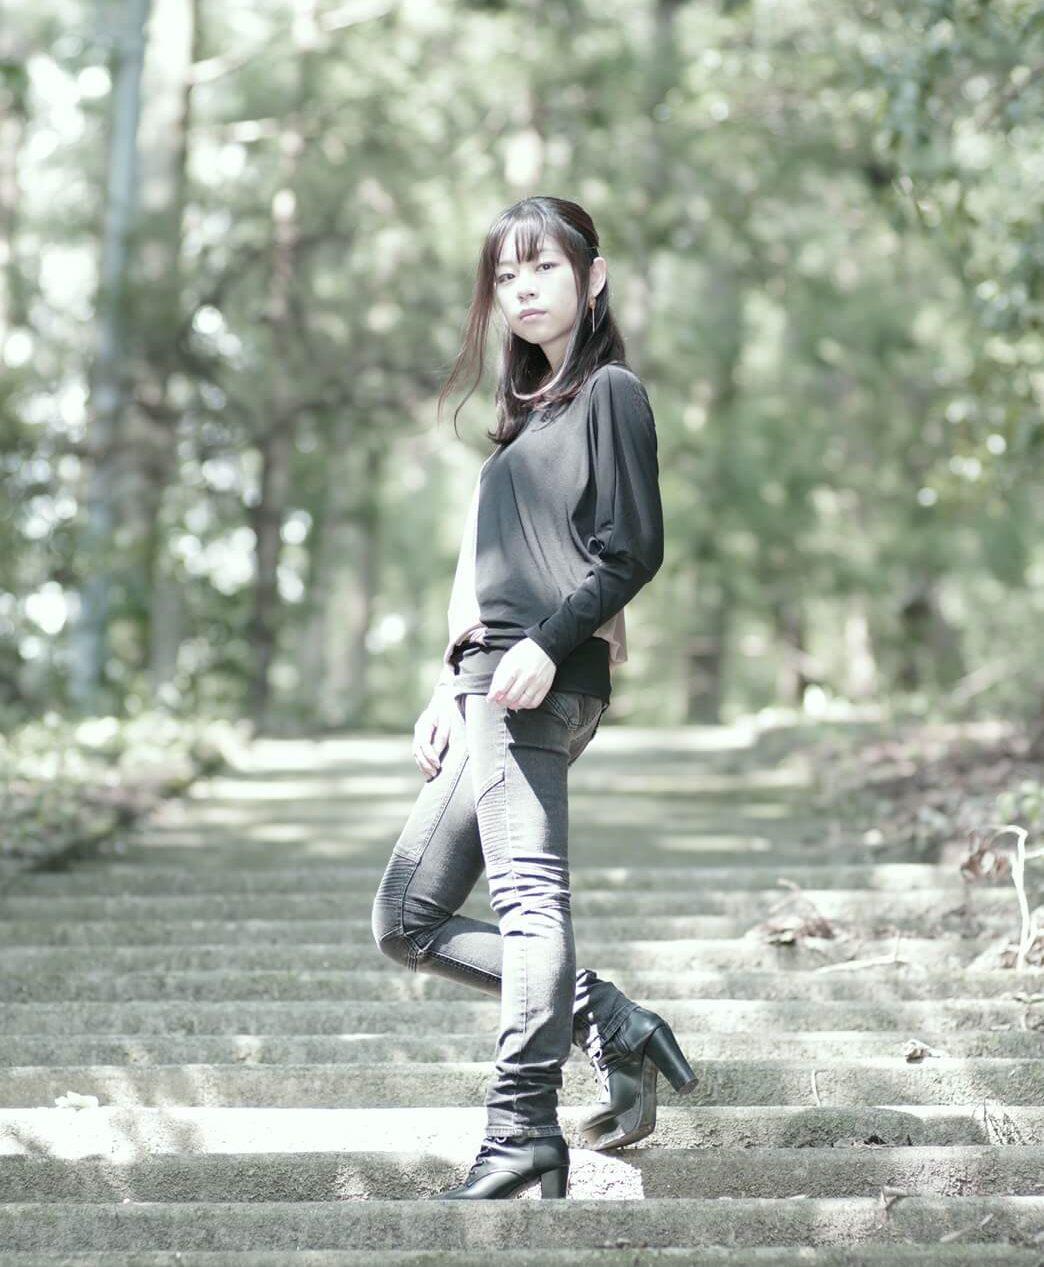 ukai-photo